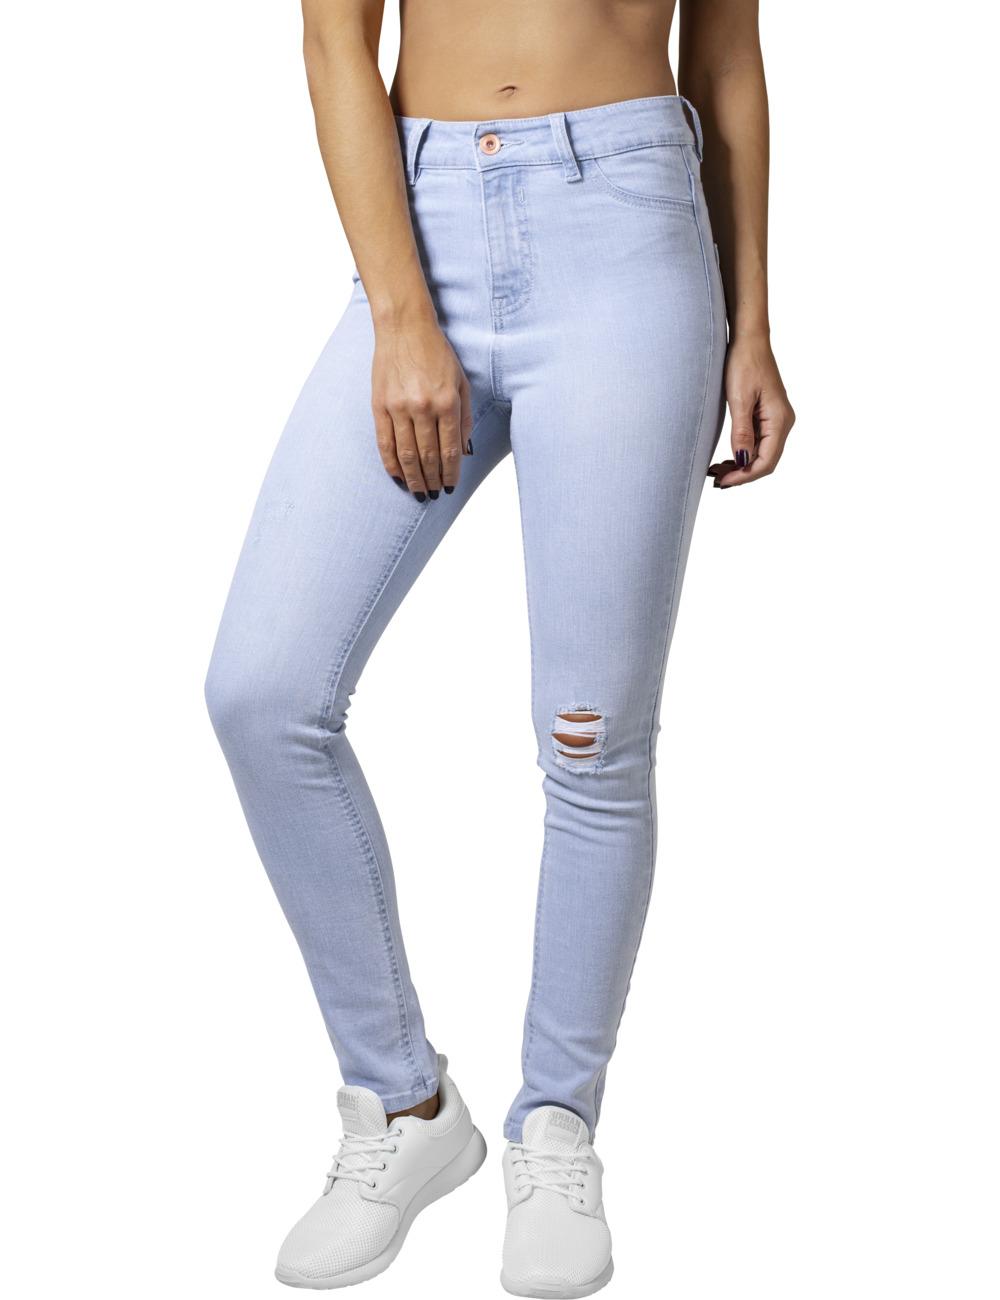 urban classics damen high waist skinny denim pants kaufen jeans direct de. Black Bedroom Furniture Sets. Home Design Ideas